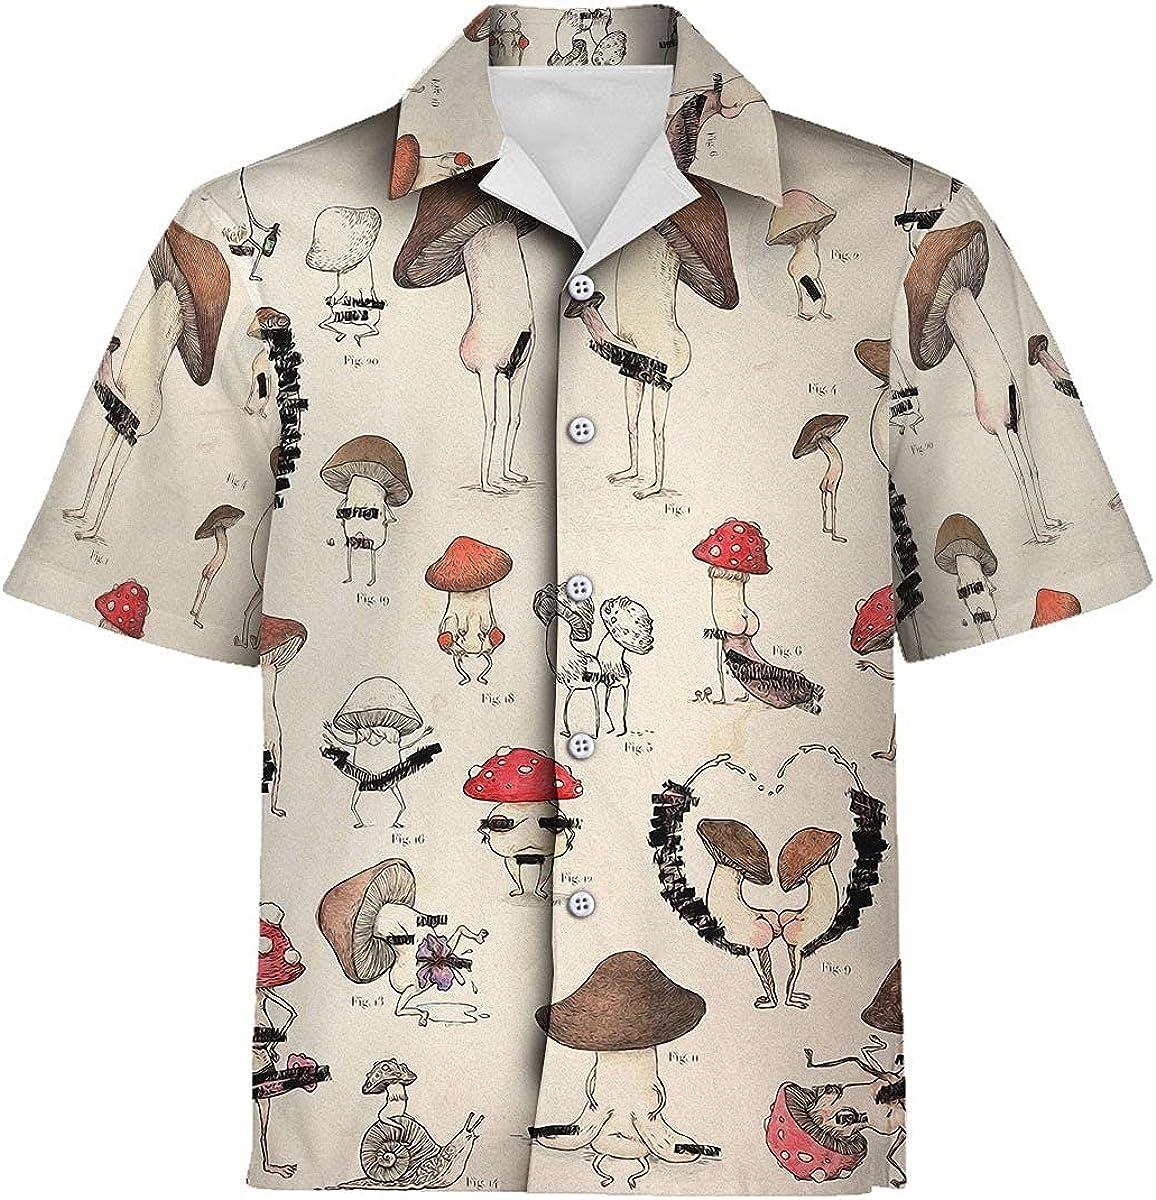 Max 89% OFF XStyles18 Limited Special Price Unisex Hawaiian Shirt Mycology Irregular Mushroom